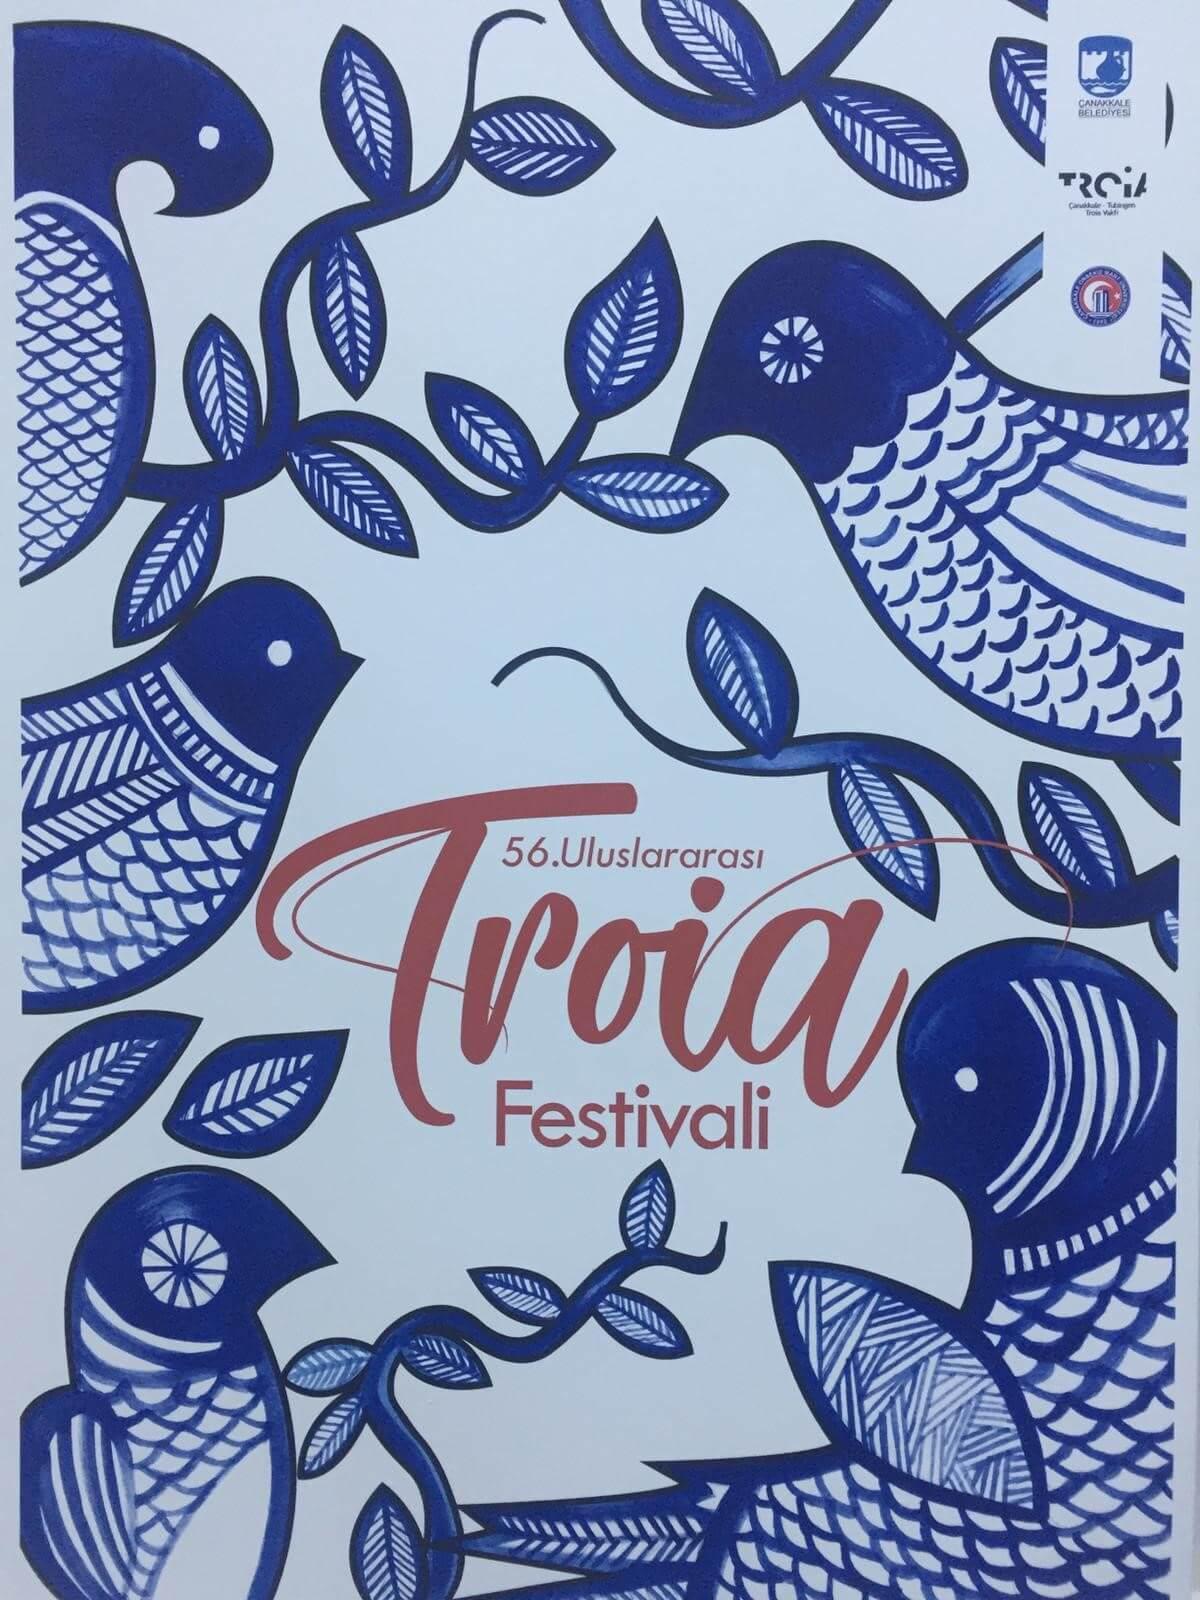 troia_M2